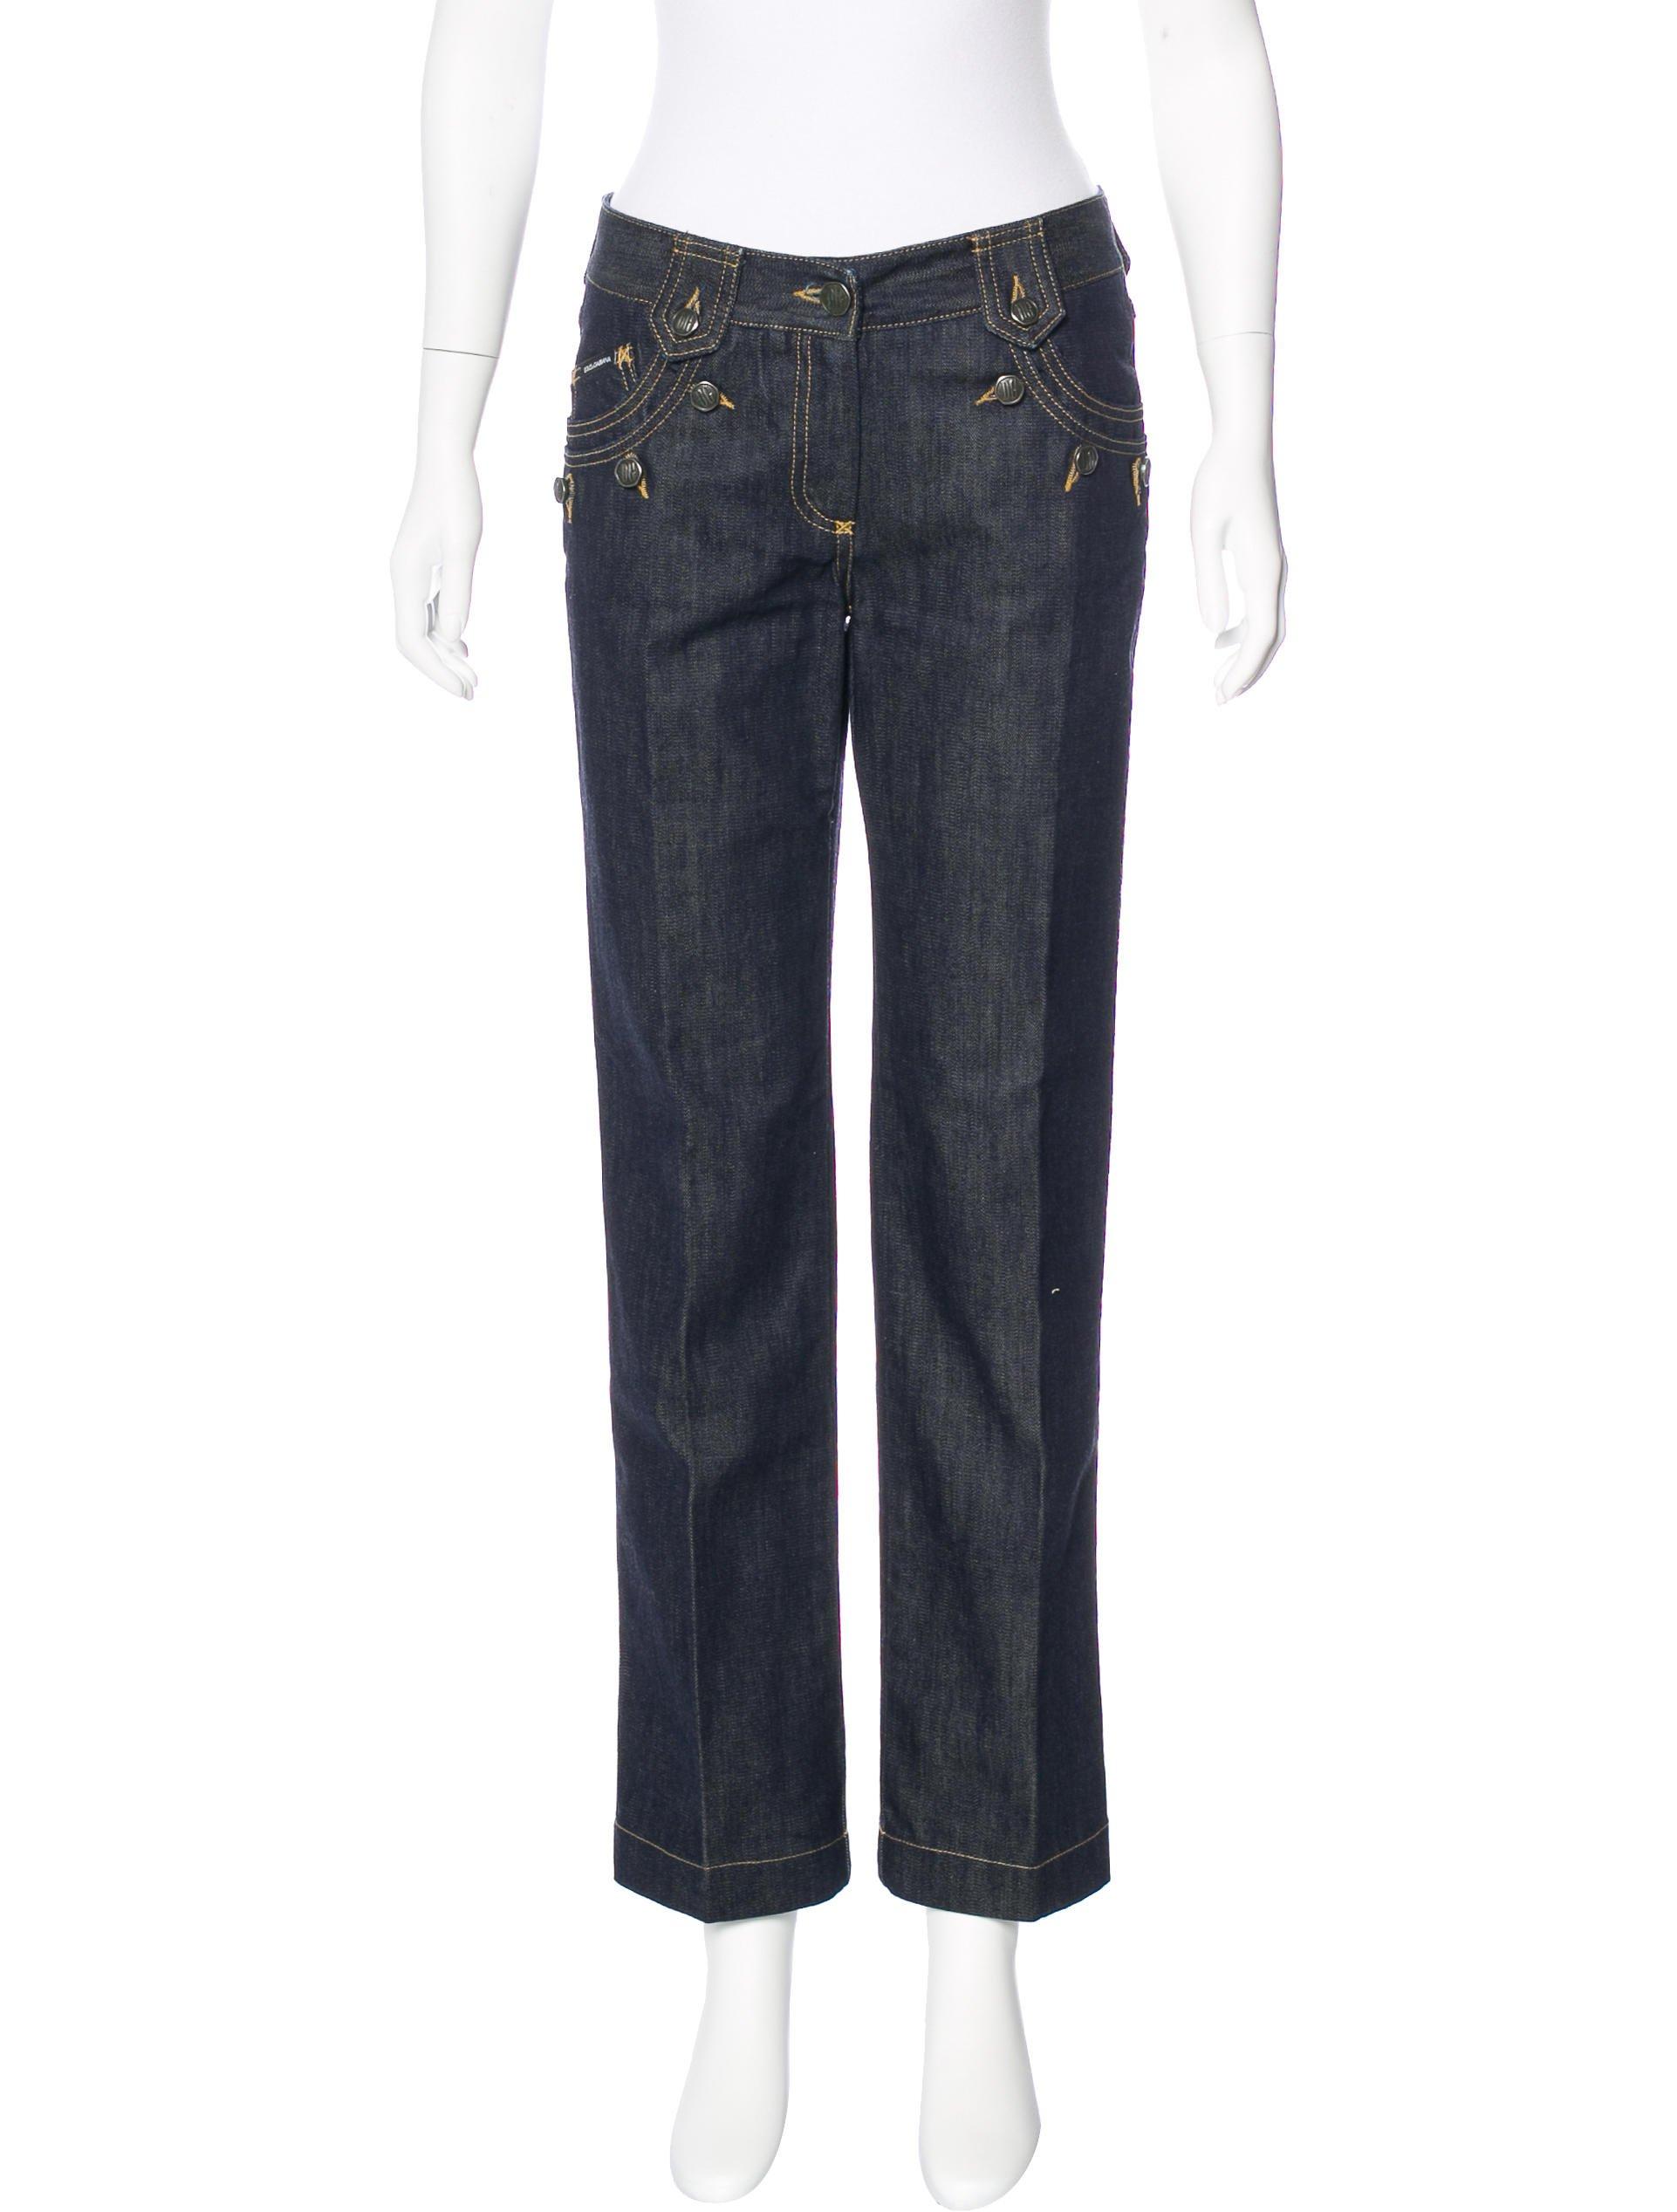 DOLCE & GABBANA Mid Rise Straight-Leg Jeans; Size: US 4; $95.00